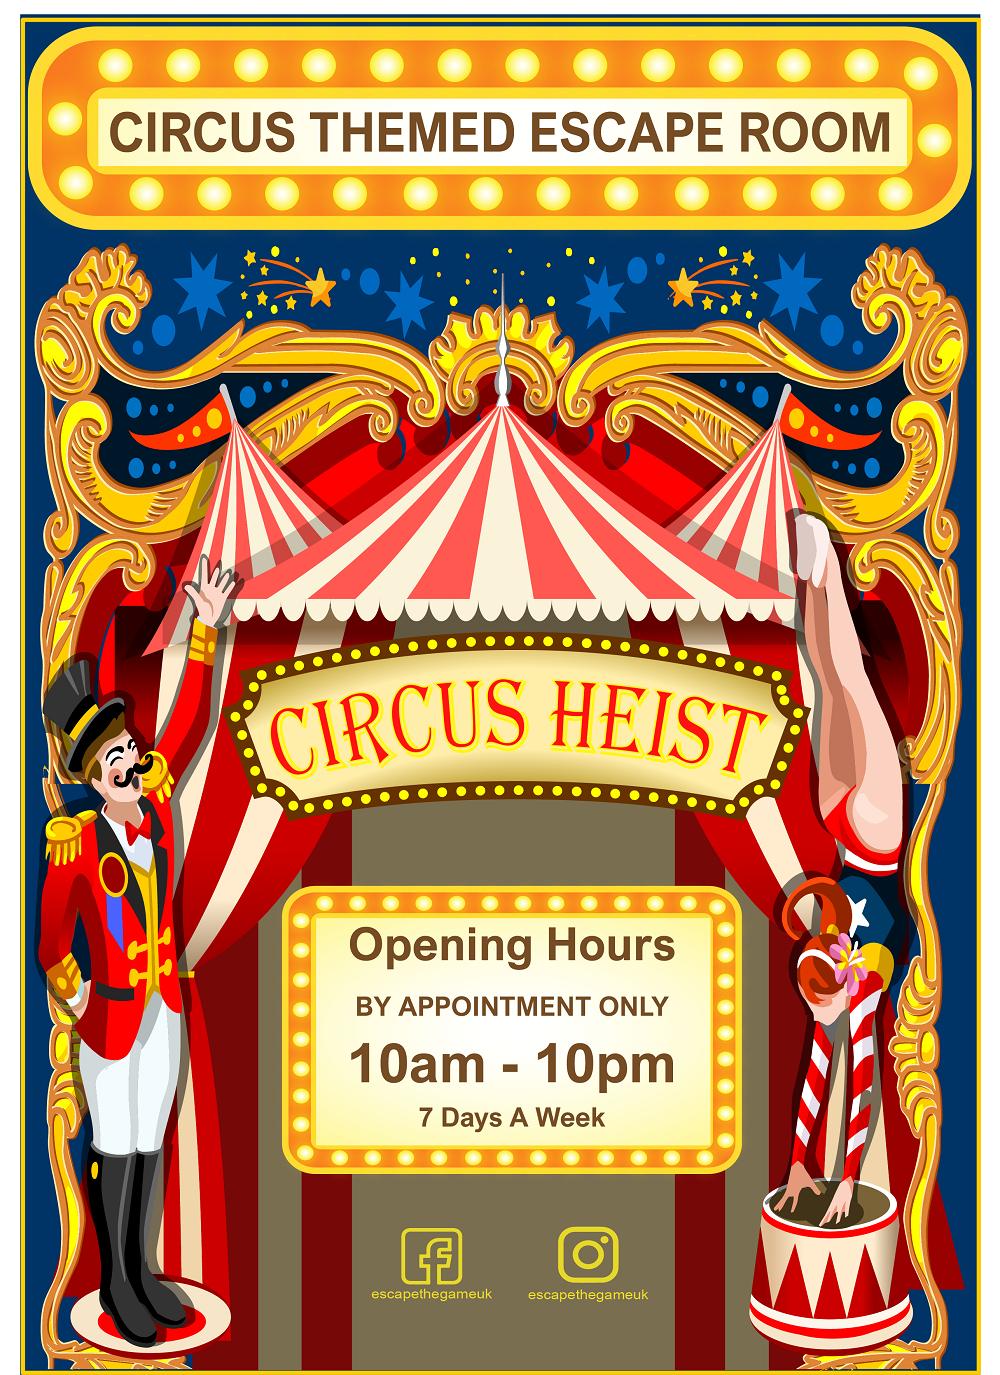 Circus Heist Poster Design  - Circus Heist Poster Design - Home